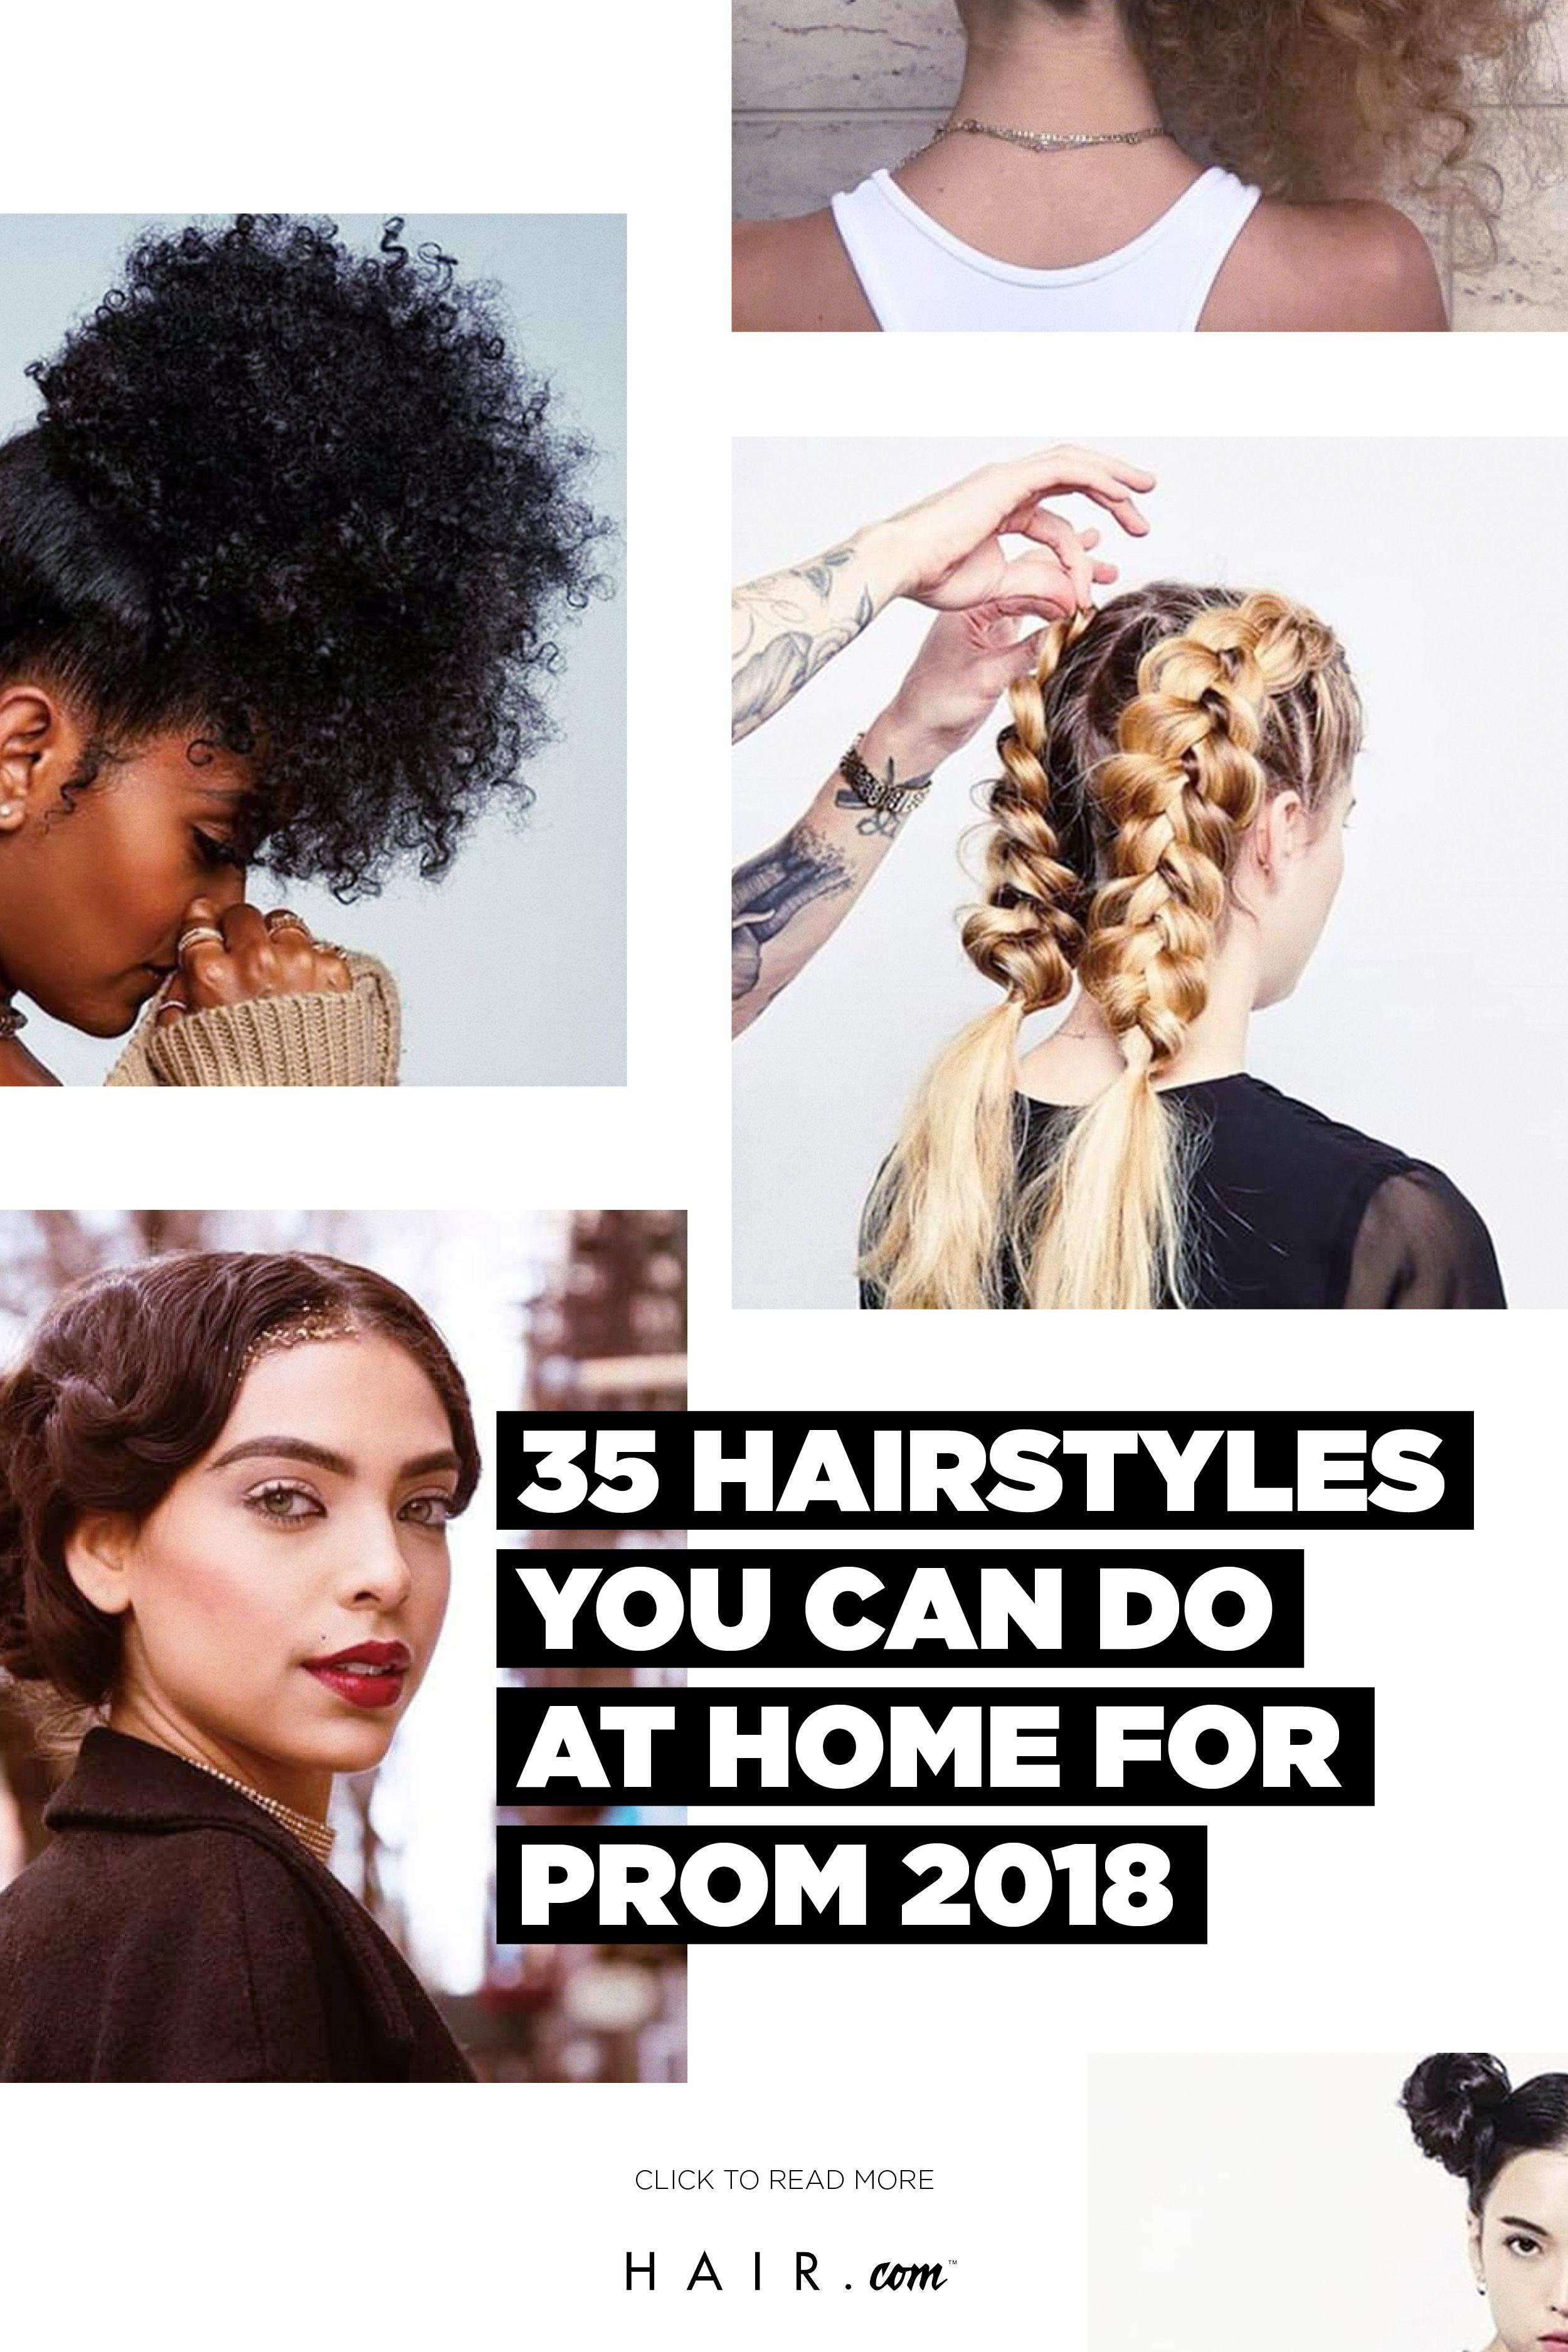 10 More Stunning Natural Hair Pictorials Protective Hairstyles For Natural Hair Goddess Hairstyles Natural Hair Styles